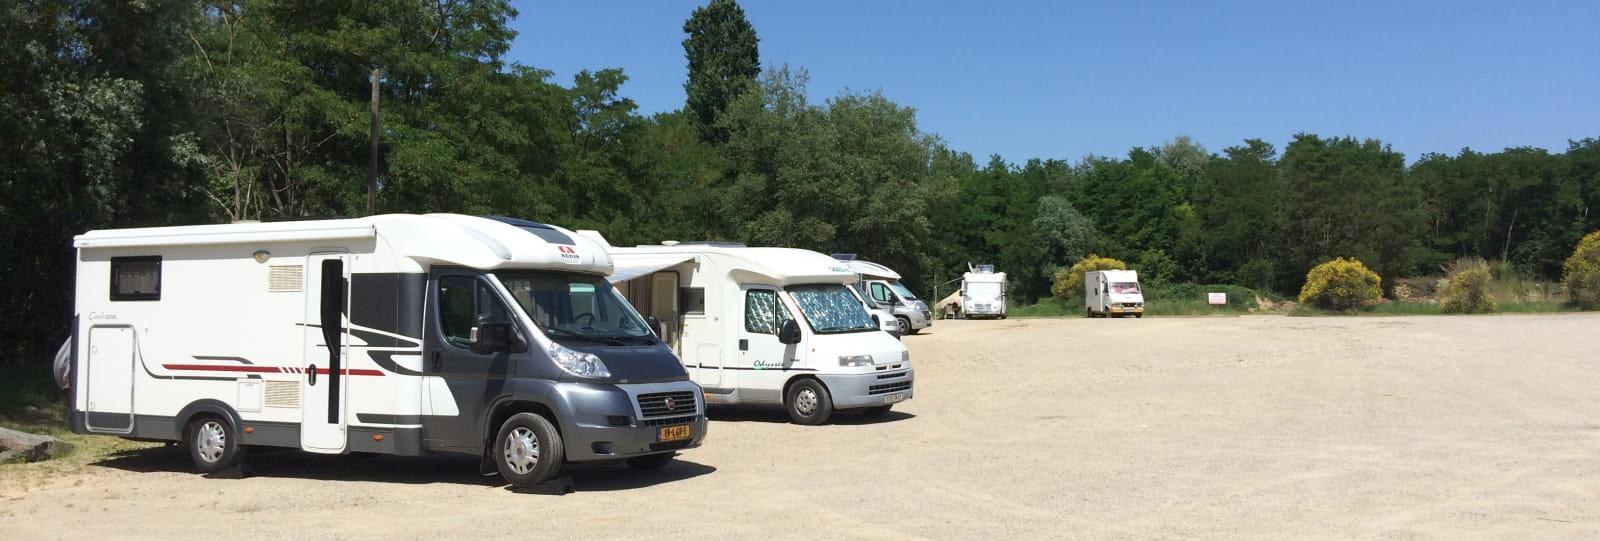 Aire Camping-Cars de Hauterives